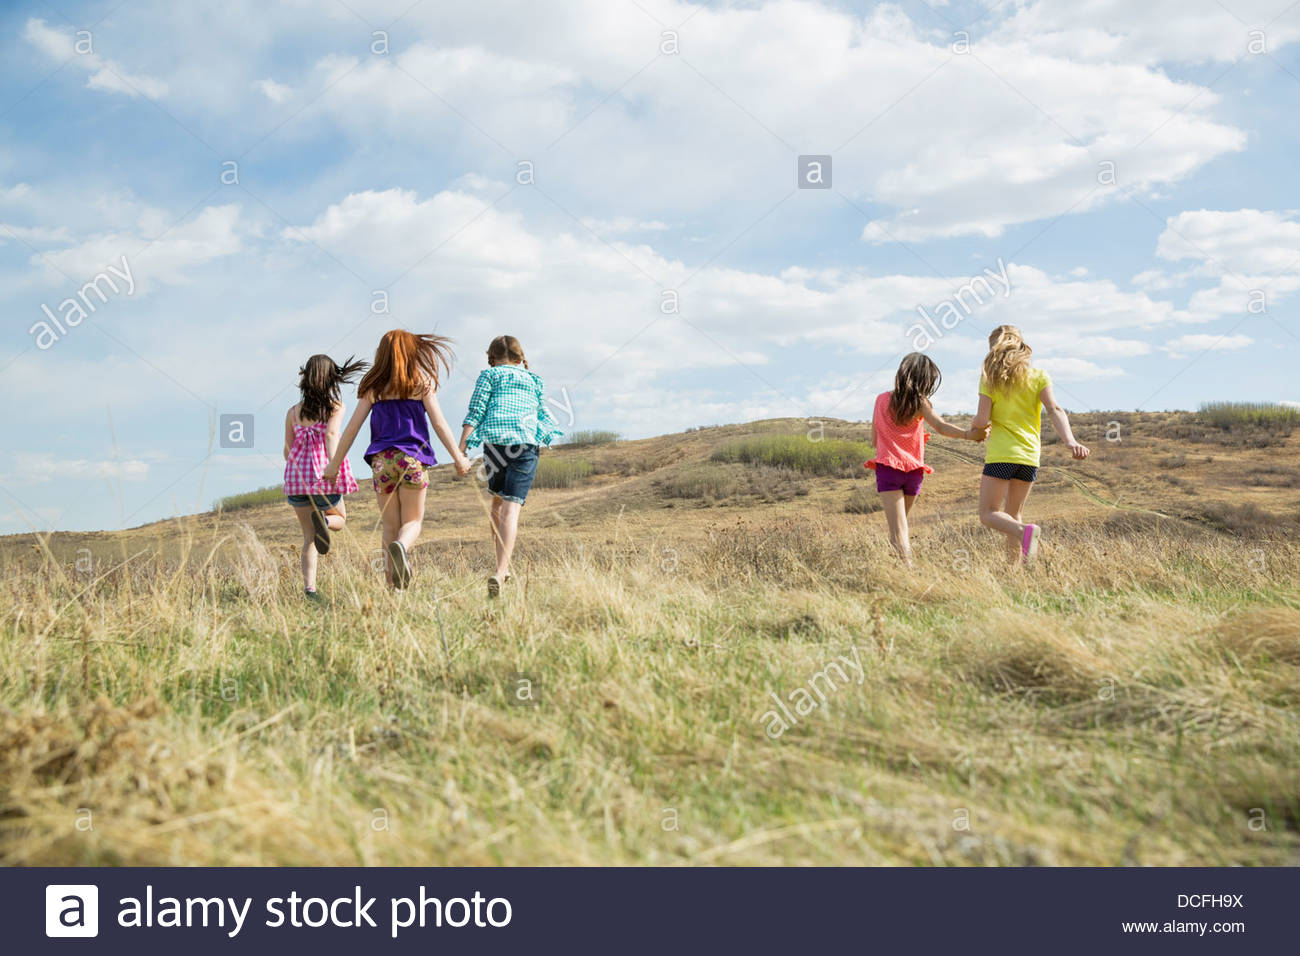 Rear view of girls walking outdoors - Stock Image